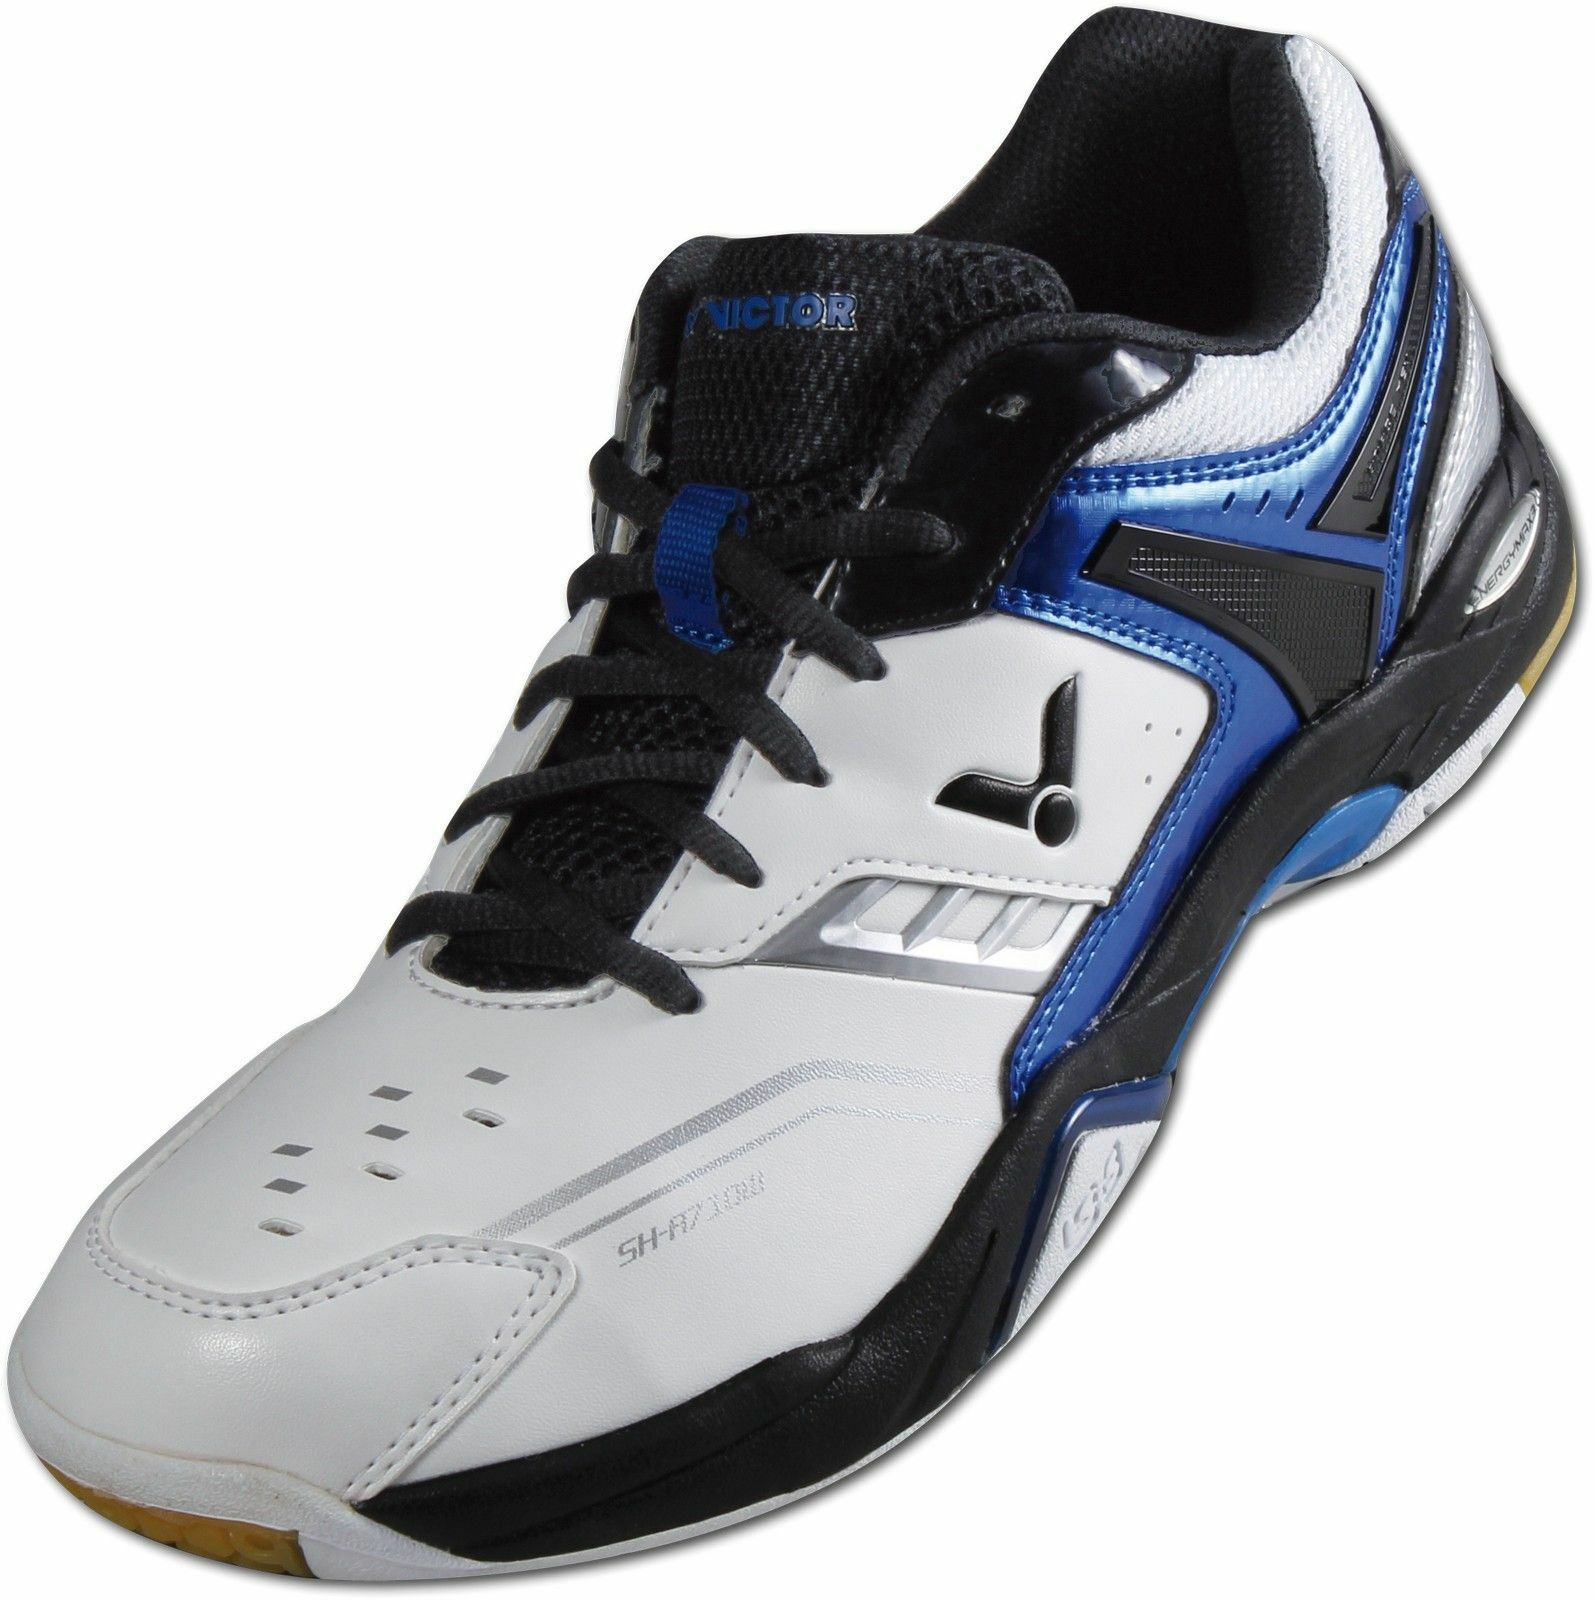 Victor Scarpa SH-A710 bluee Scarpa Badminton Ping-pong Squash